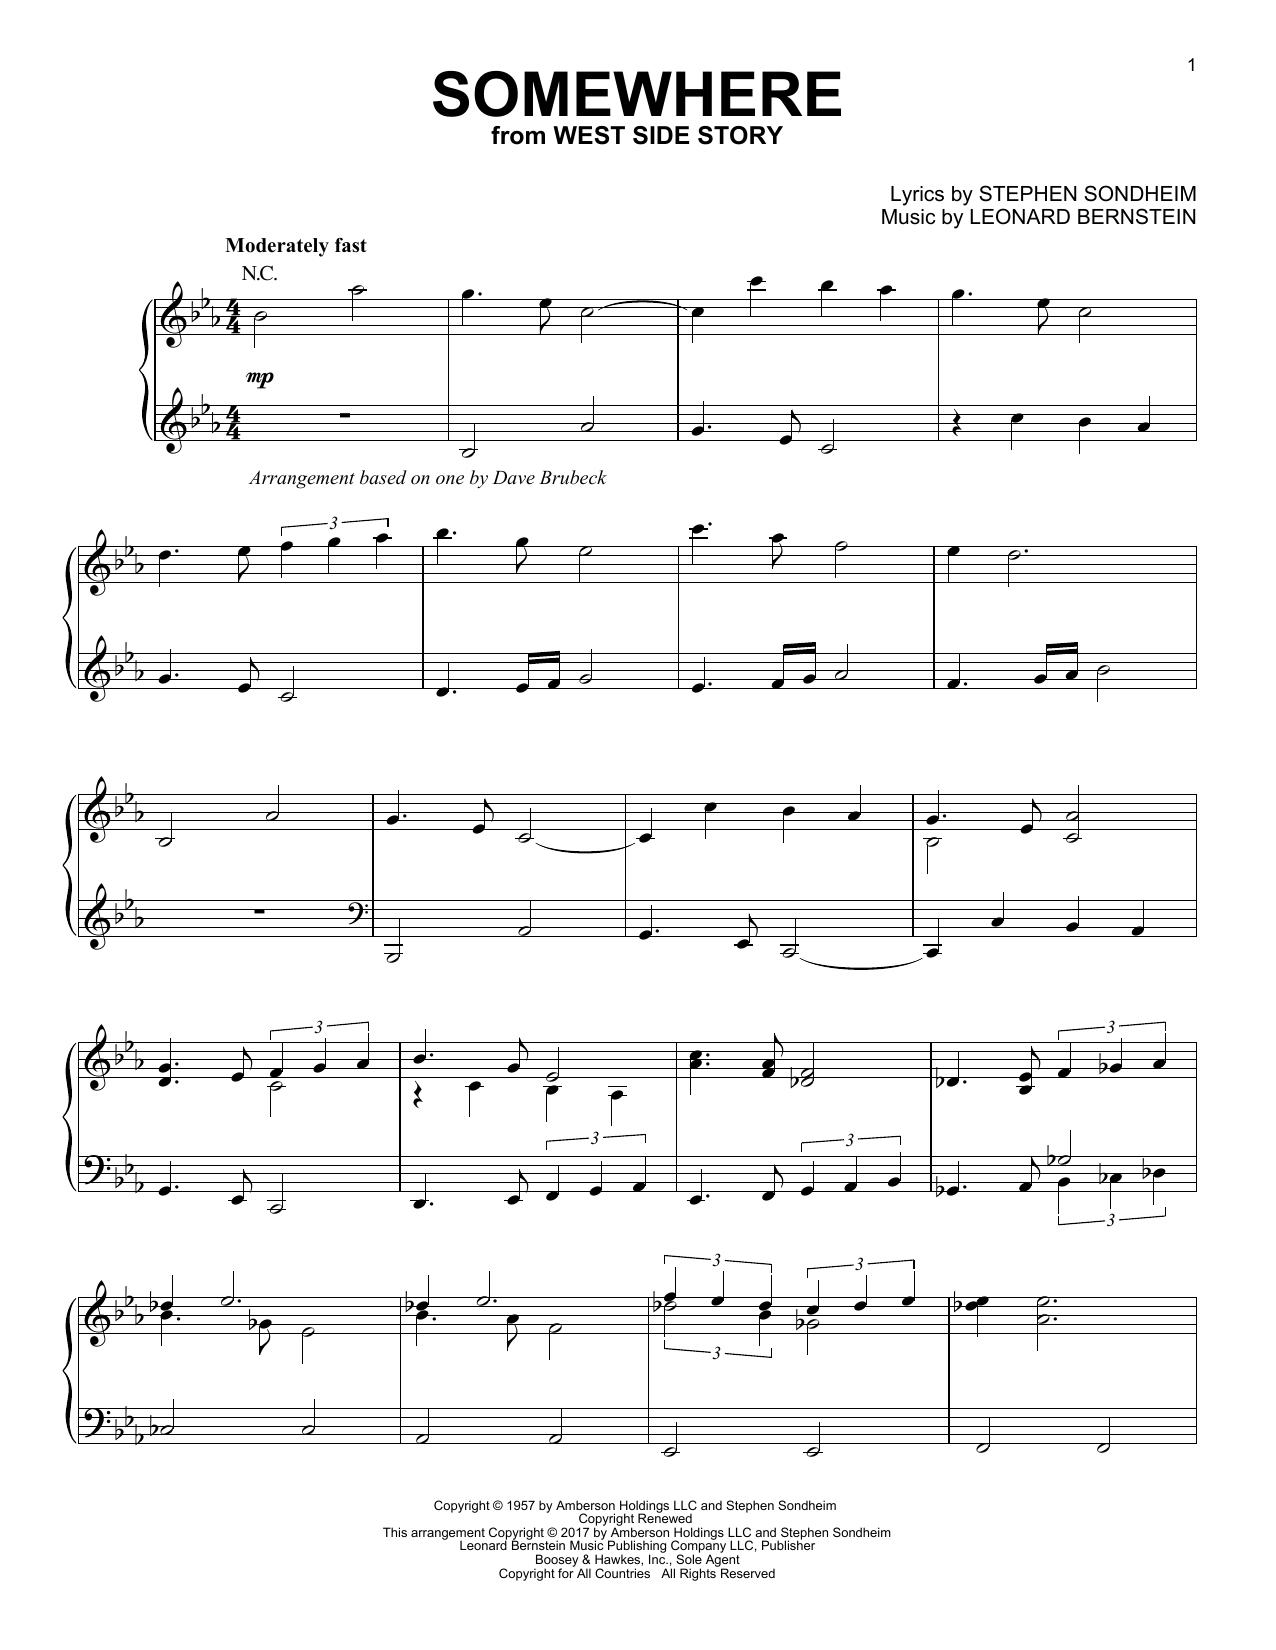 Dave Brubeck Somewhere [Jazz version] sheet music notes and chords. Download Printable PDF.